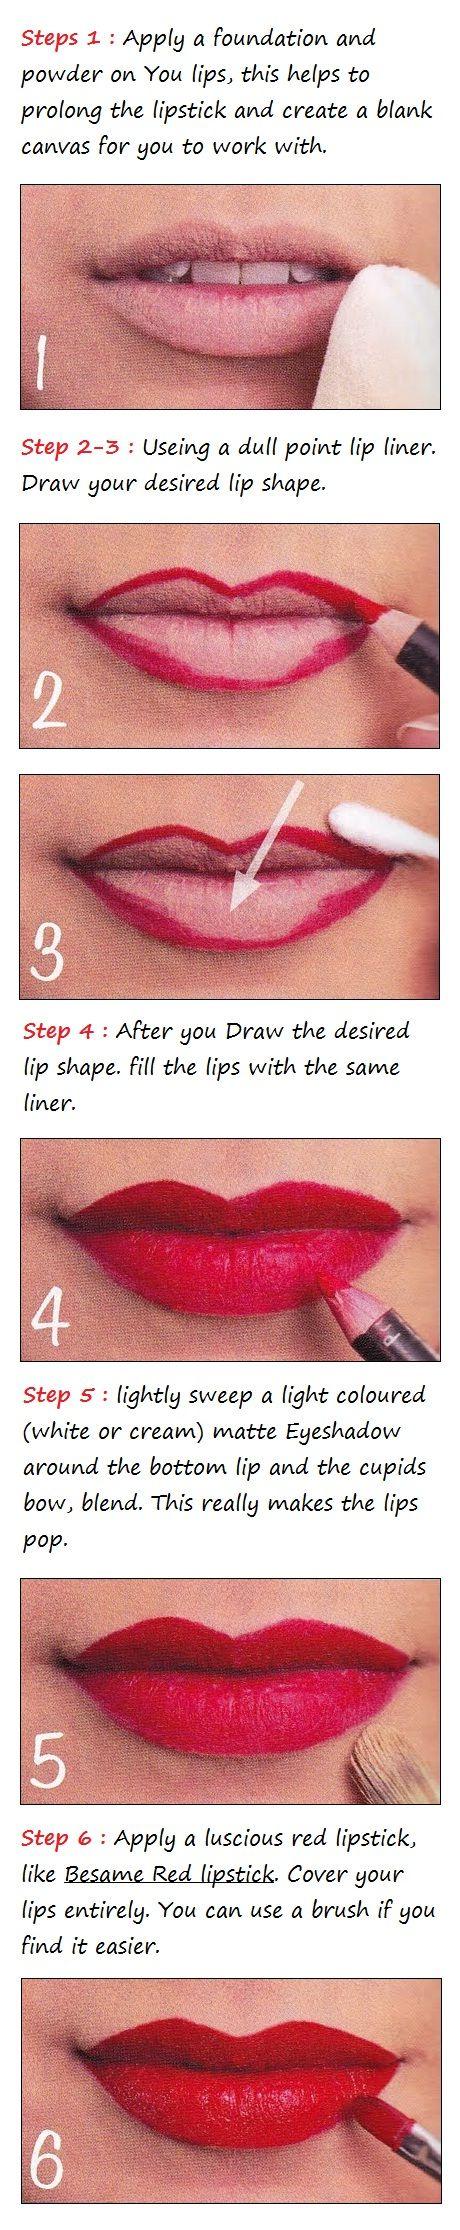 Glamorous Red Lips Tutorial | Beauty Tutorials